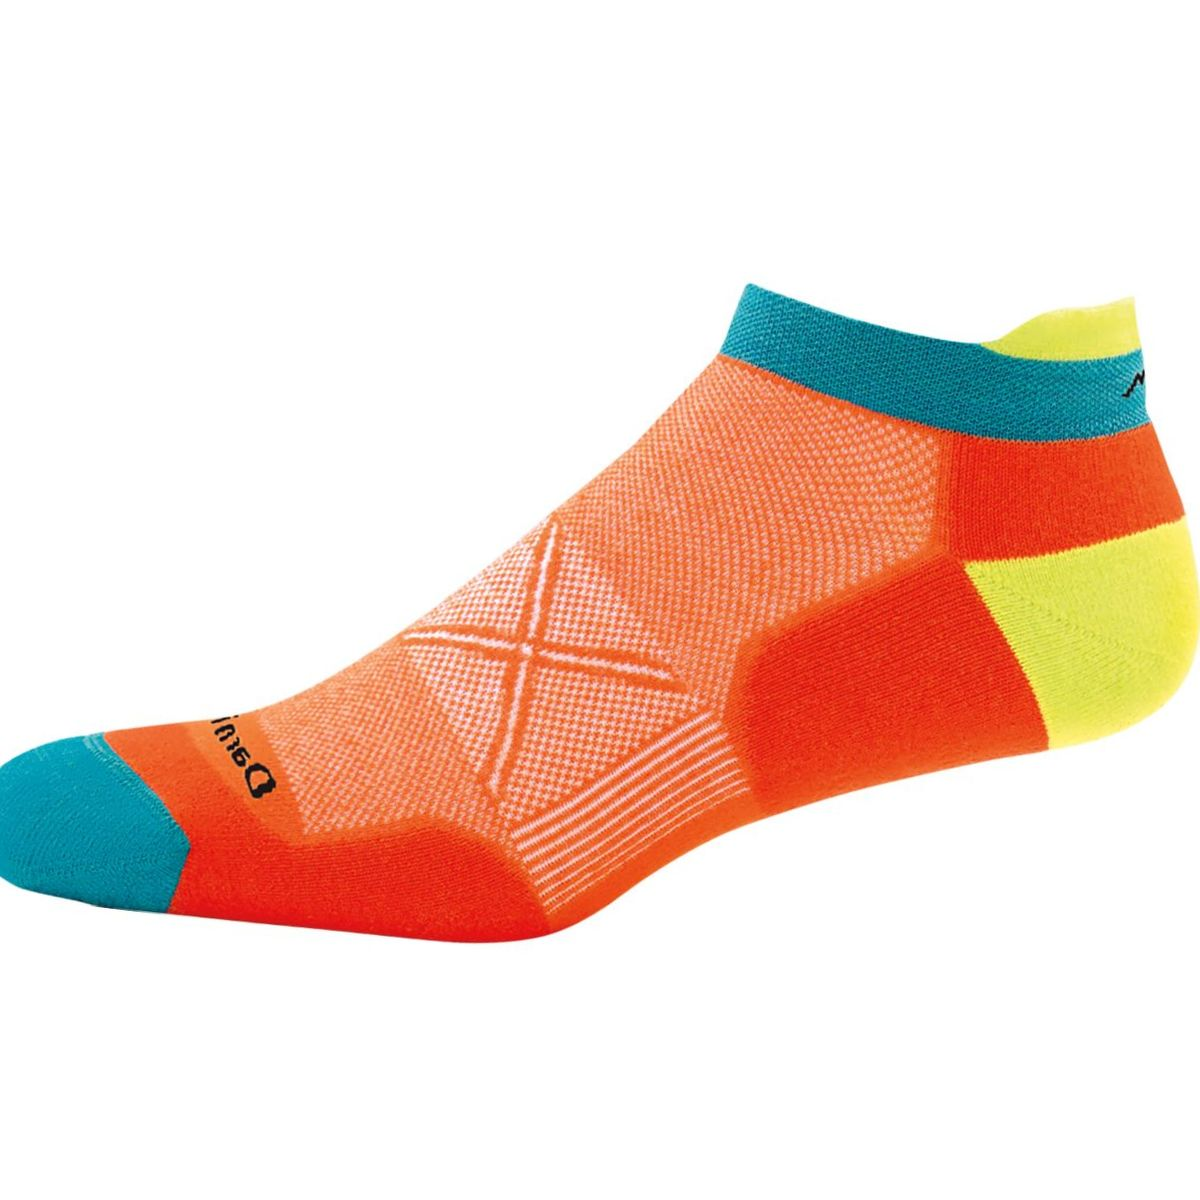 Darn Tough VertexStripe CoolMax No Show Tab Ultra-Light Sock - Men's